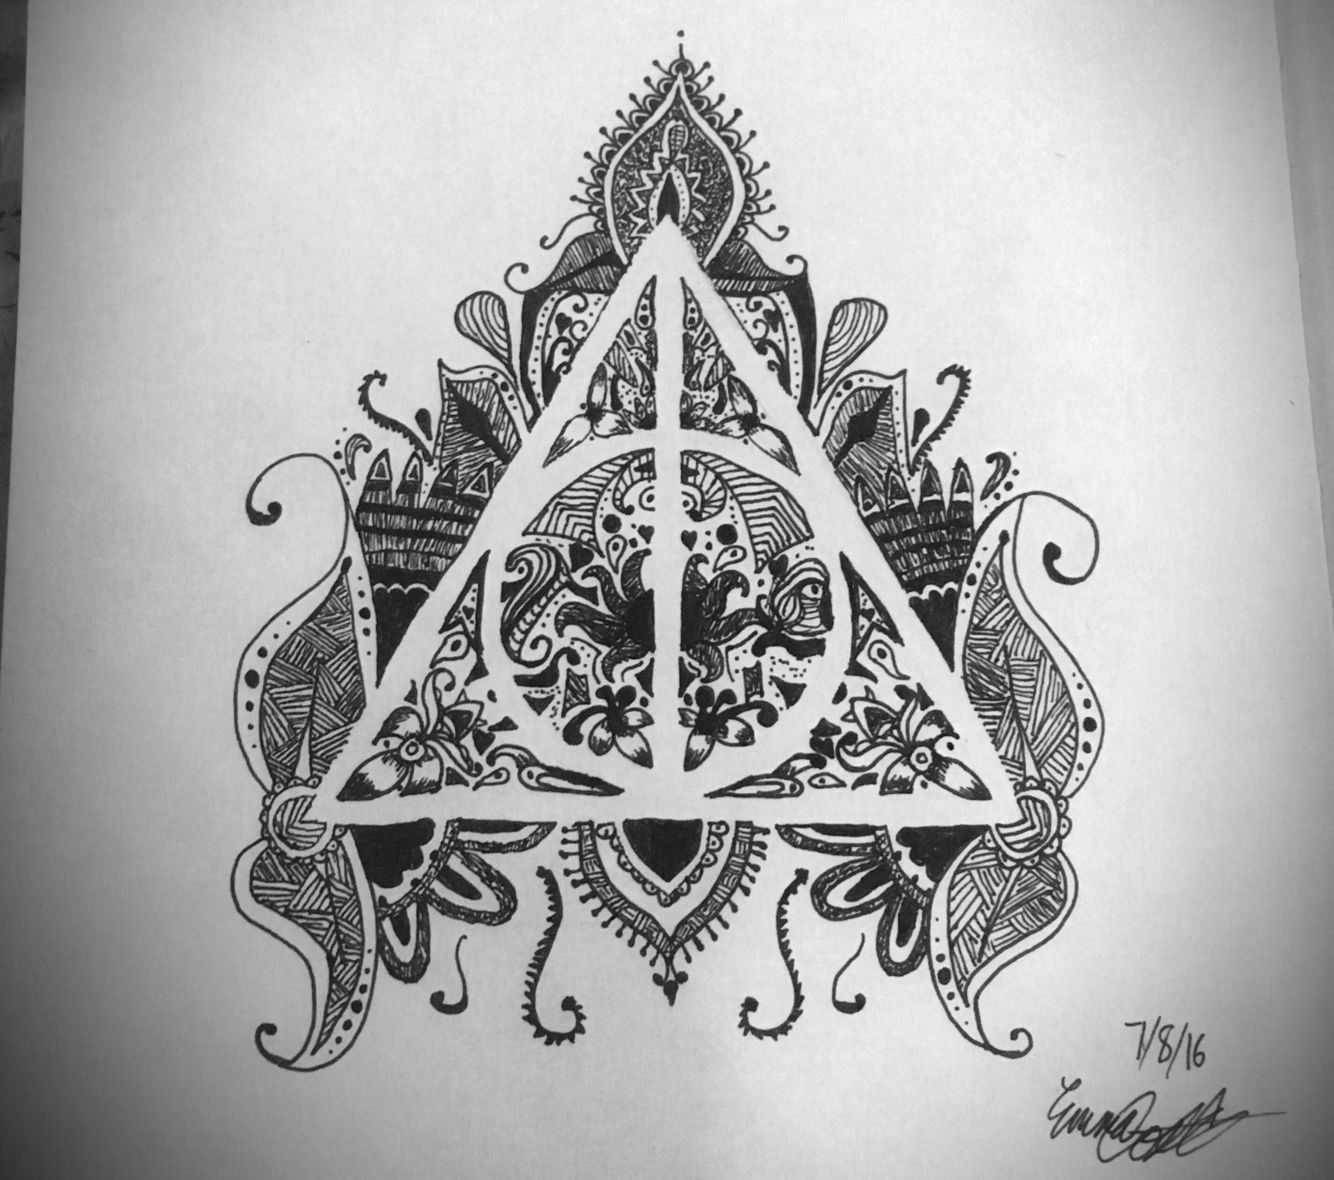 Deathly Hallows Art Pinterest Emcosta7777 Deathly Hallows Art Deathly Hallows Tattoo Triangle Tattoo